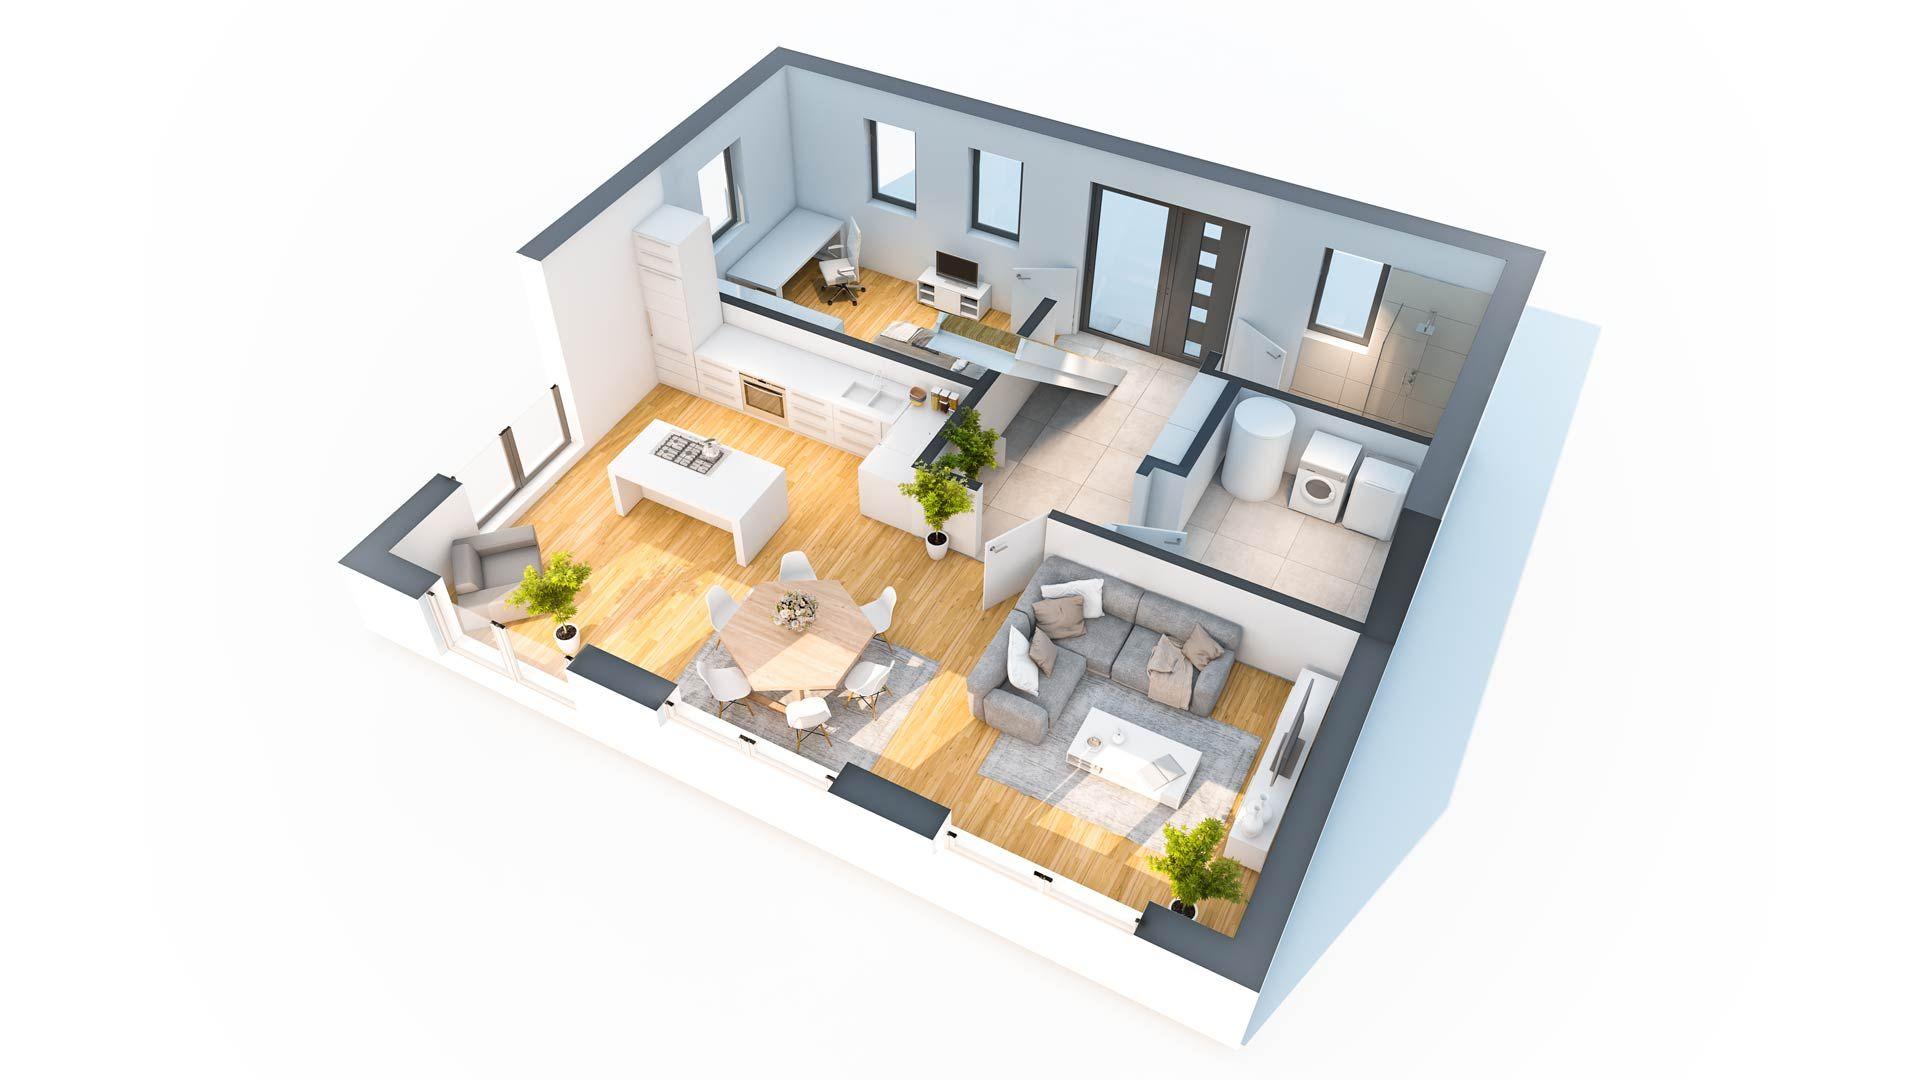 Hausidee Esche Haus, Haus ideen, Grundriss